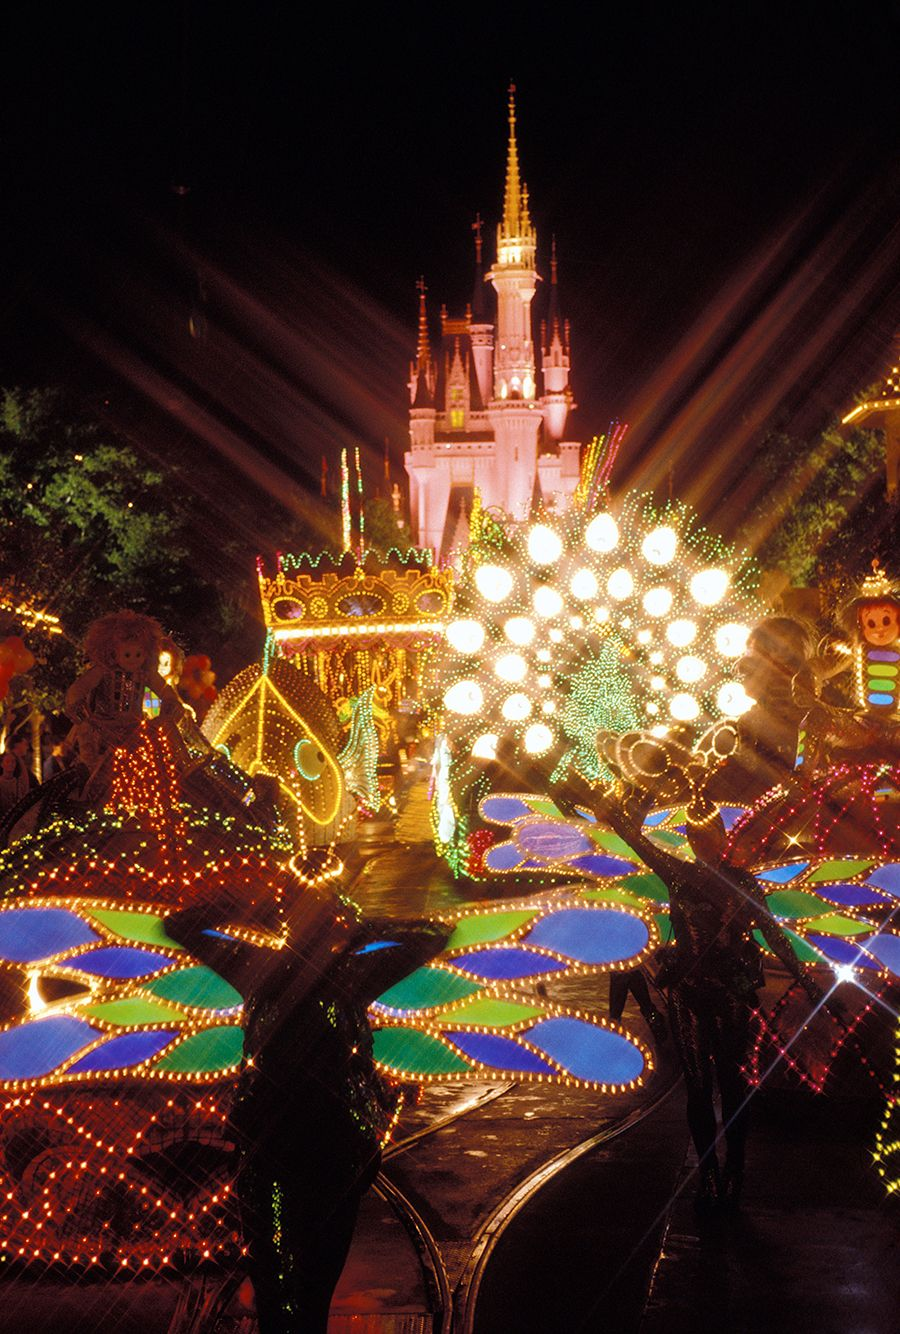 Spectro Magic 1991 Disney electrical parade, Disney